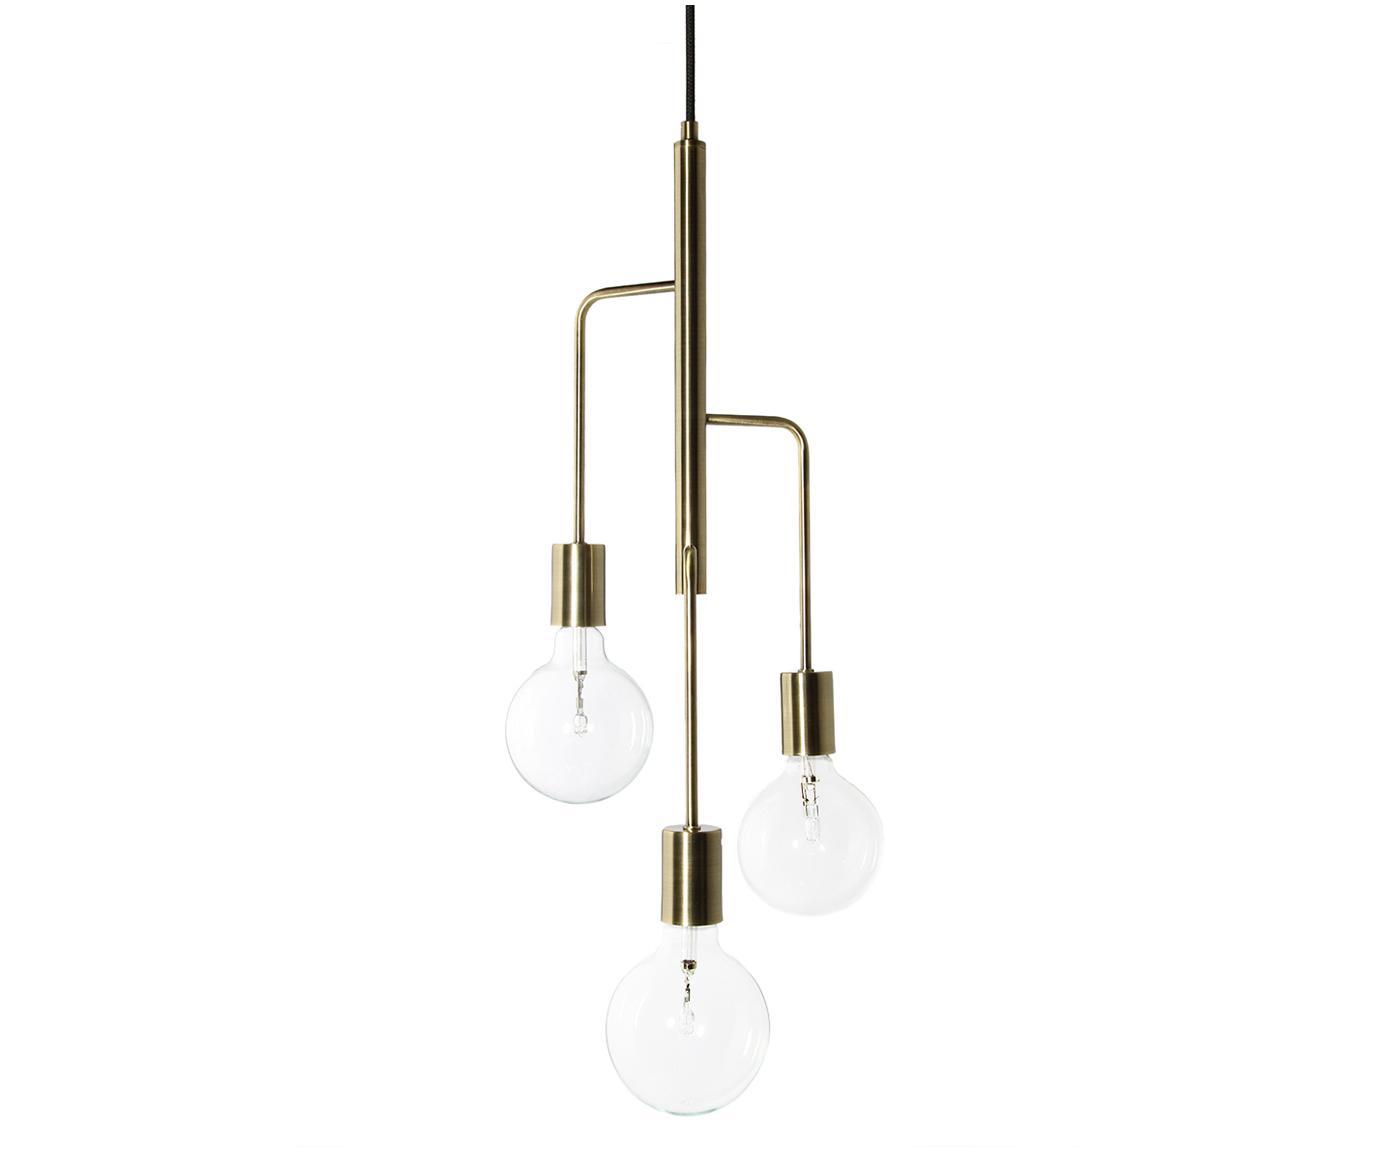 Scandi hanglamp Cool, Vermessingd metaal, Glanzend messingkleurig, Ø 25 x H 60 cm